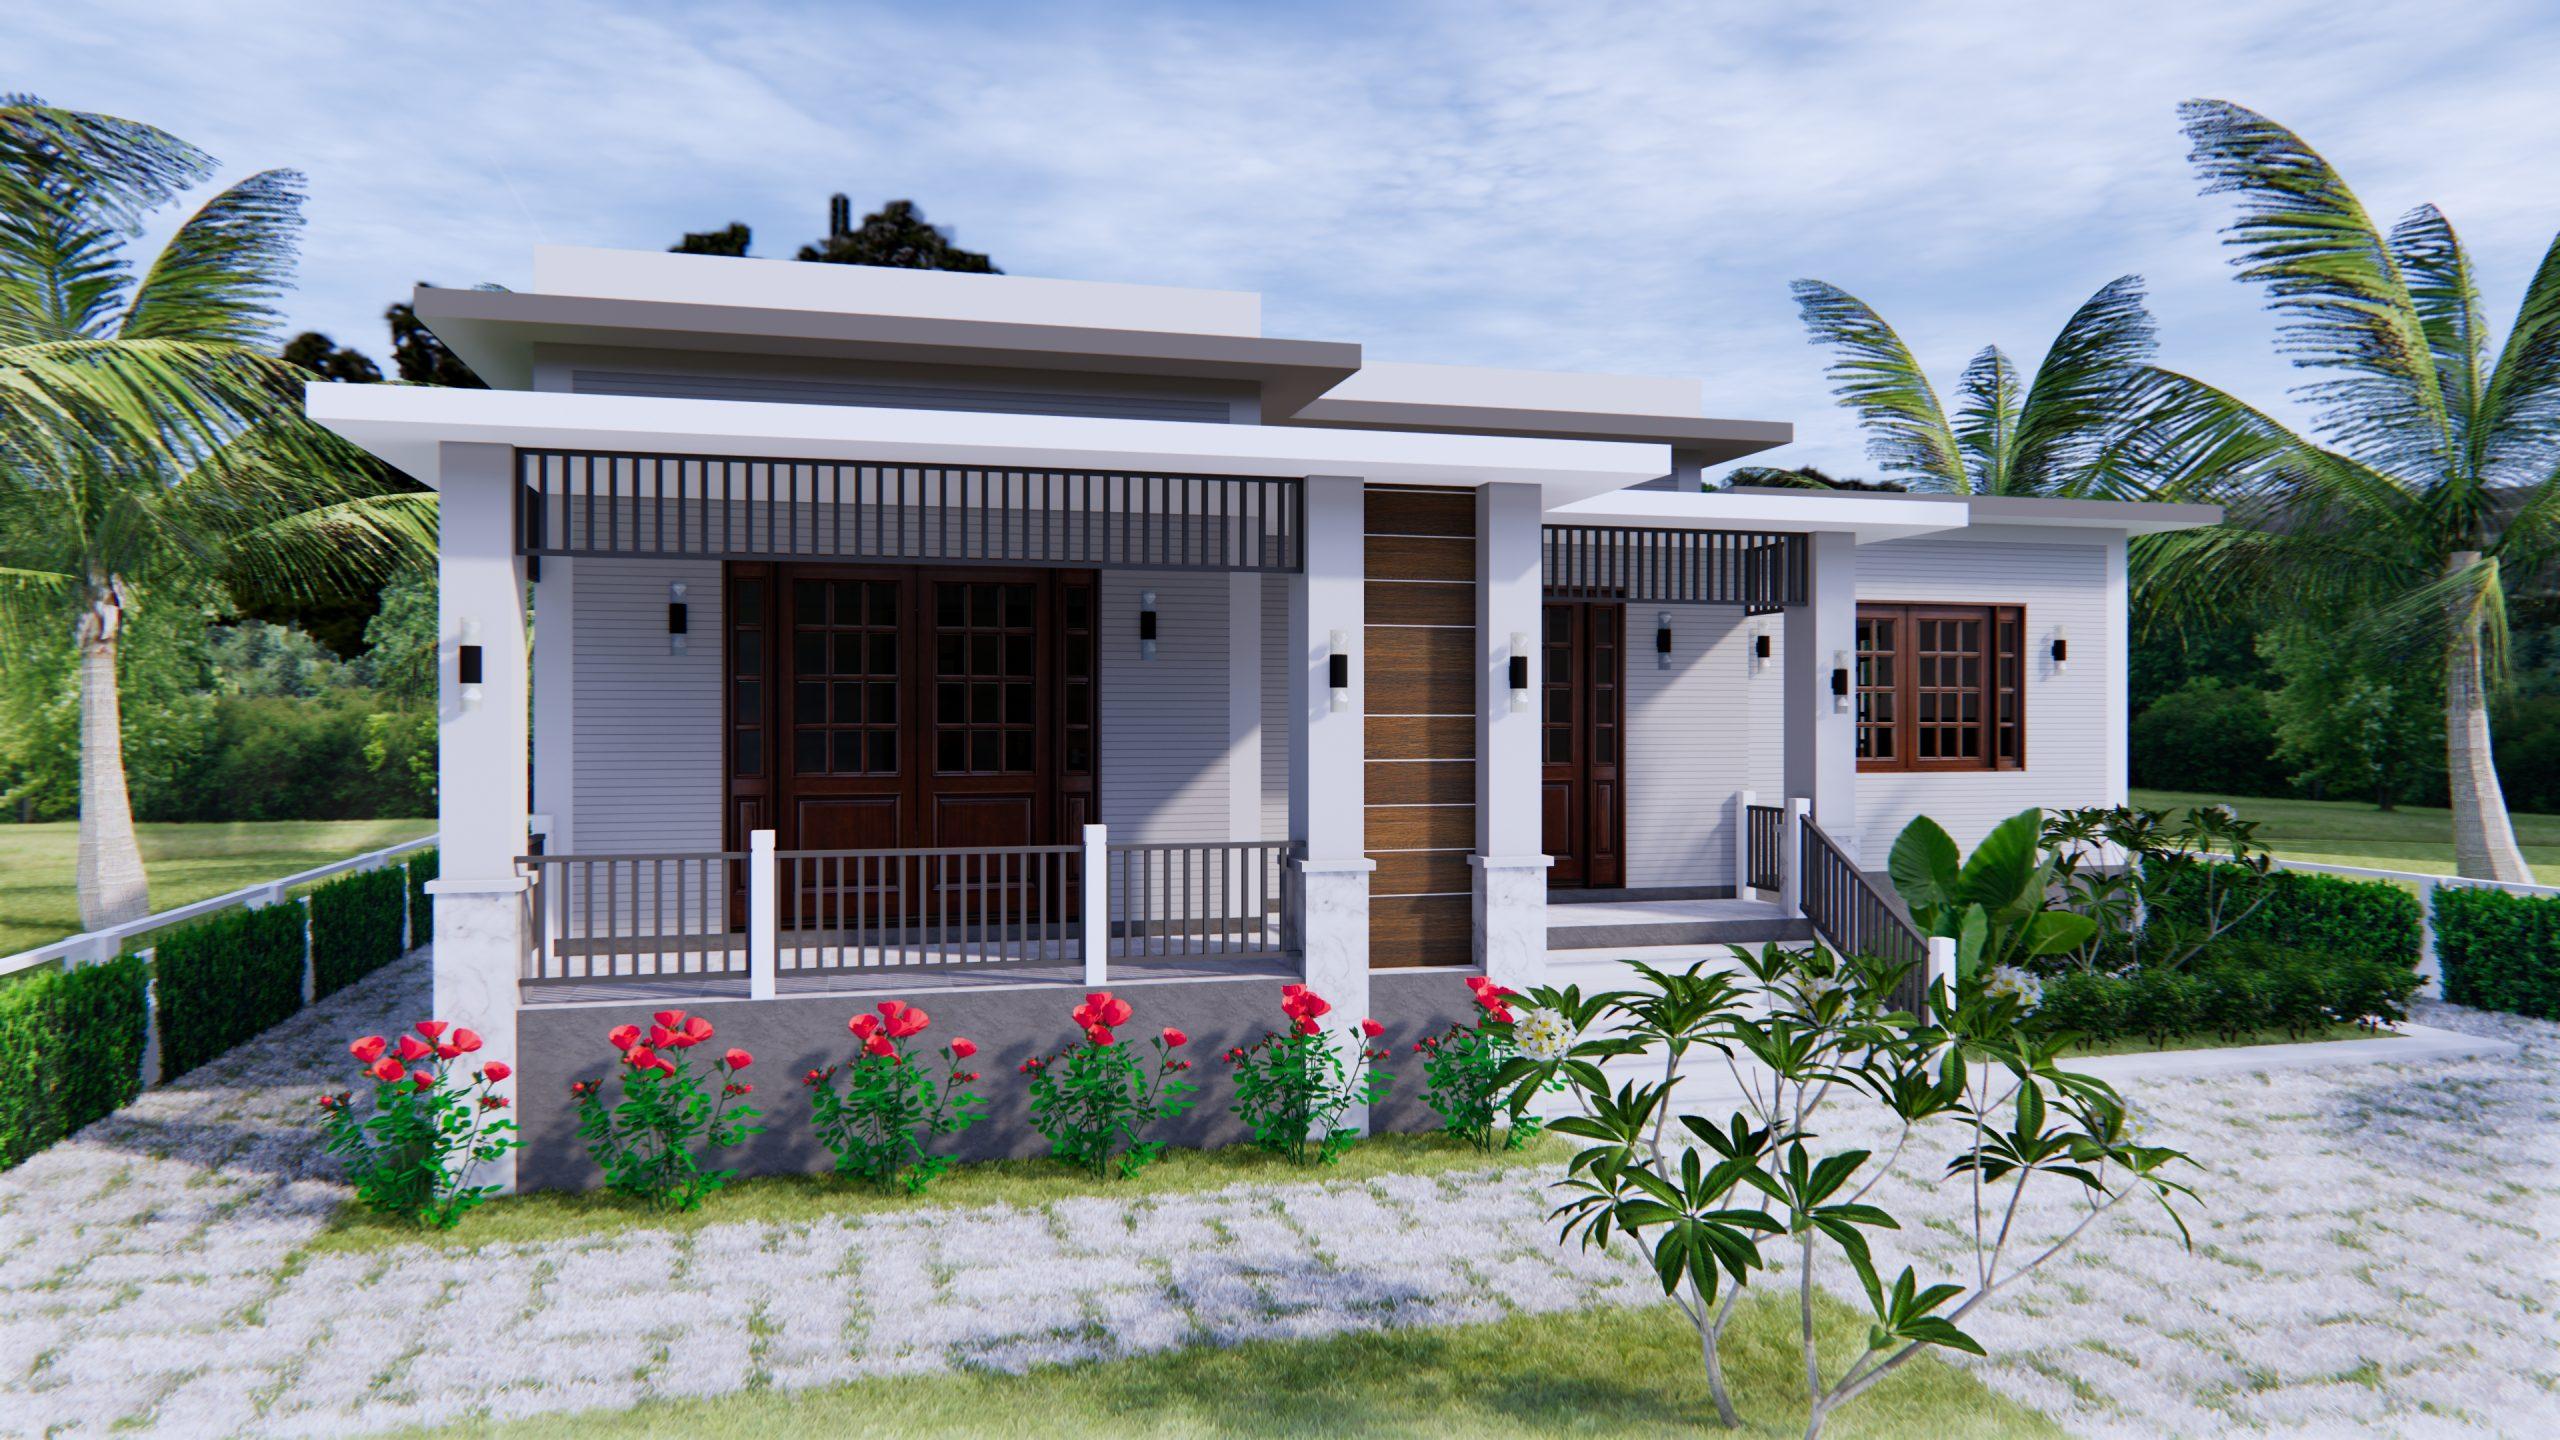 House Plan Drawing 12x11 Meter 39x36 Feet 3 Beds 7